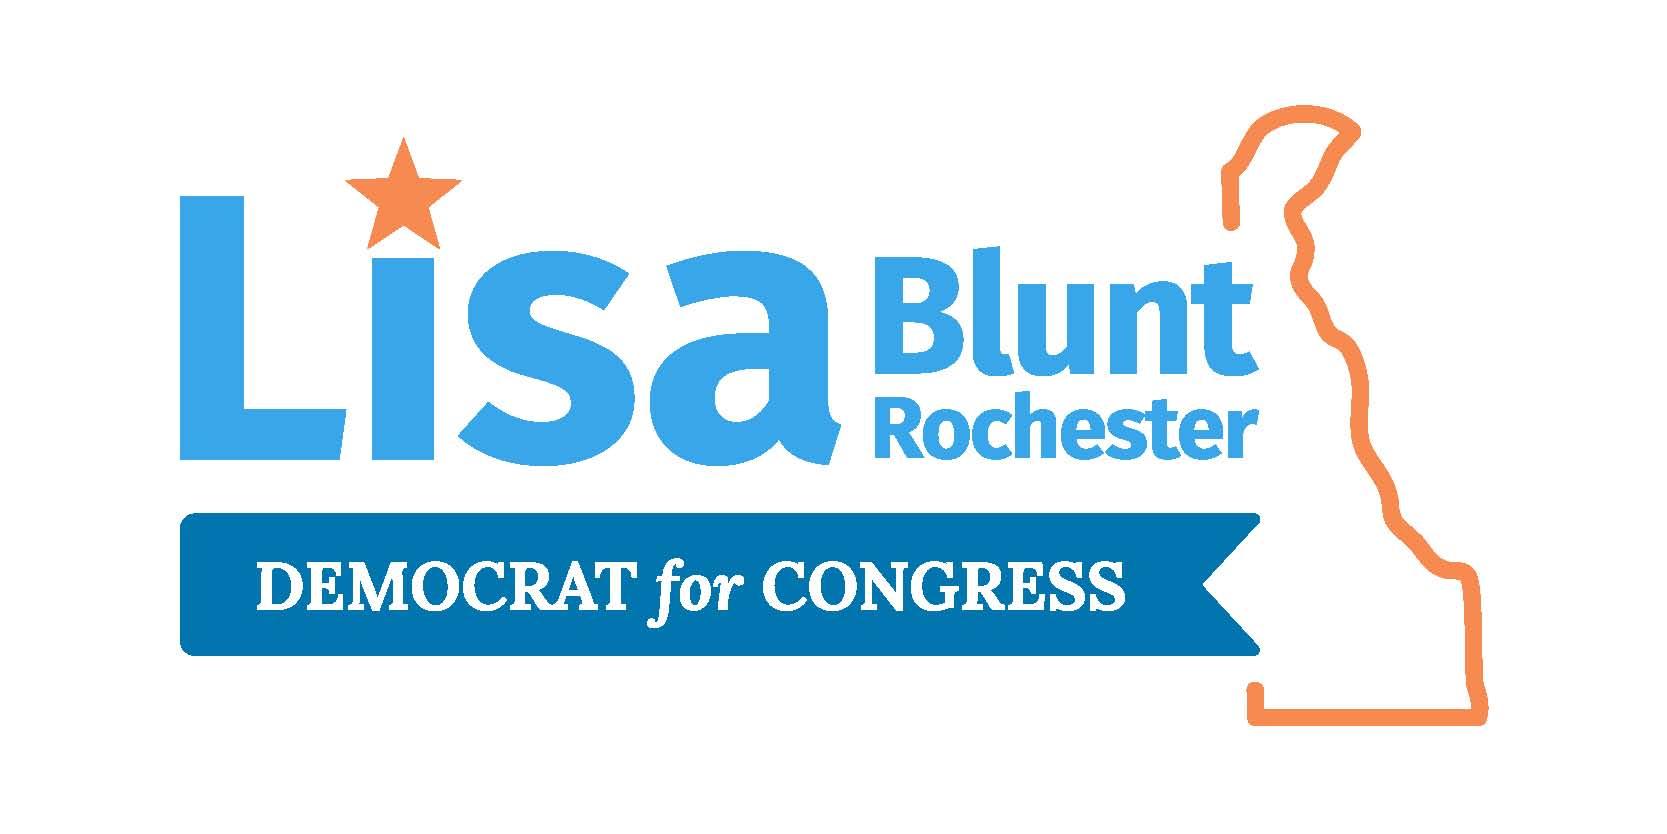 Lisa Blunt Rochester